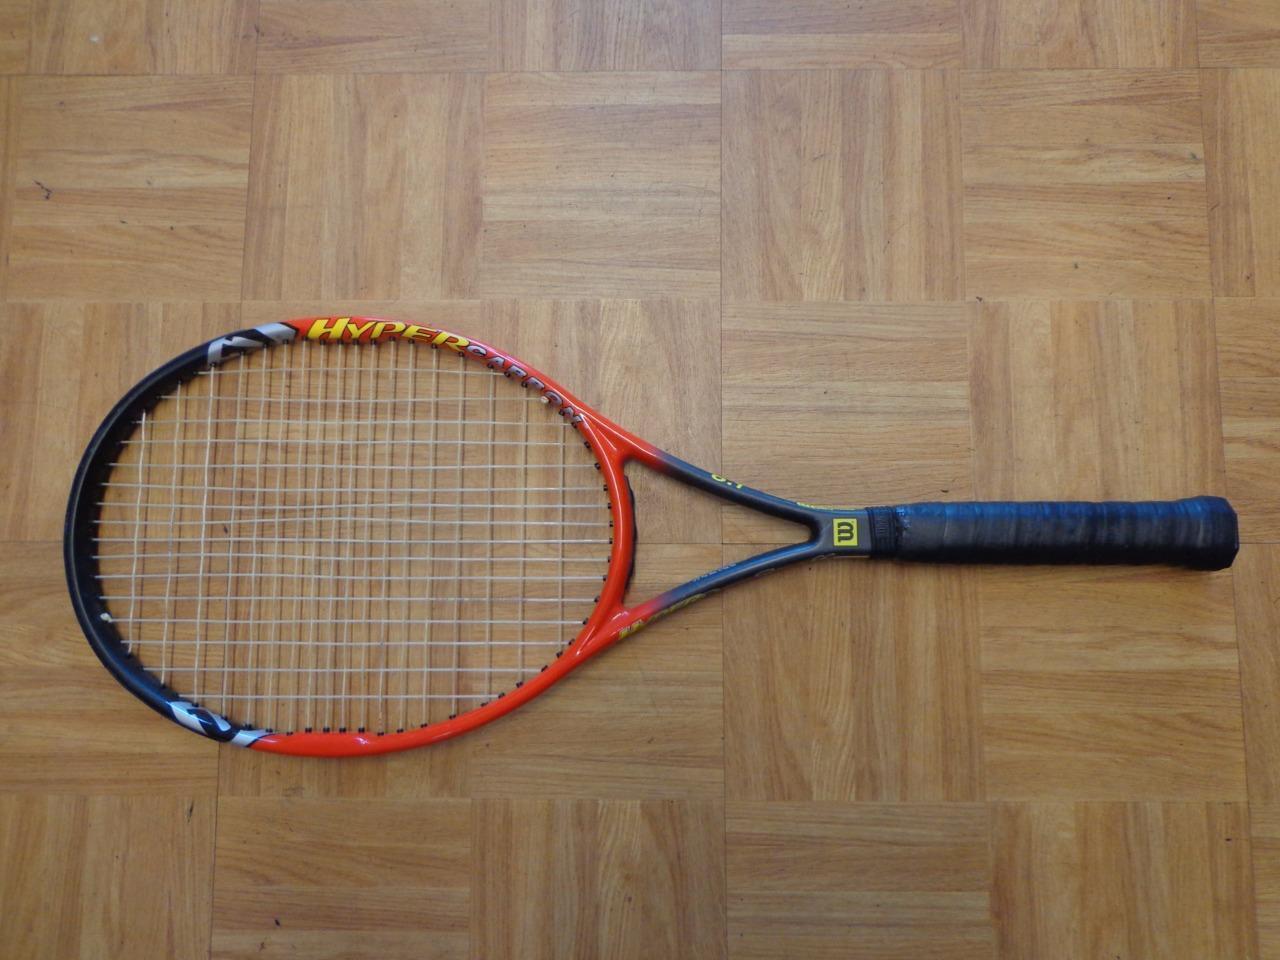 Wilson Hyper Pro Staff 6.1 midplus 95 16x18 motif 4 3 8 grip raquette de tennis